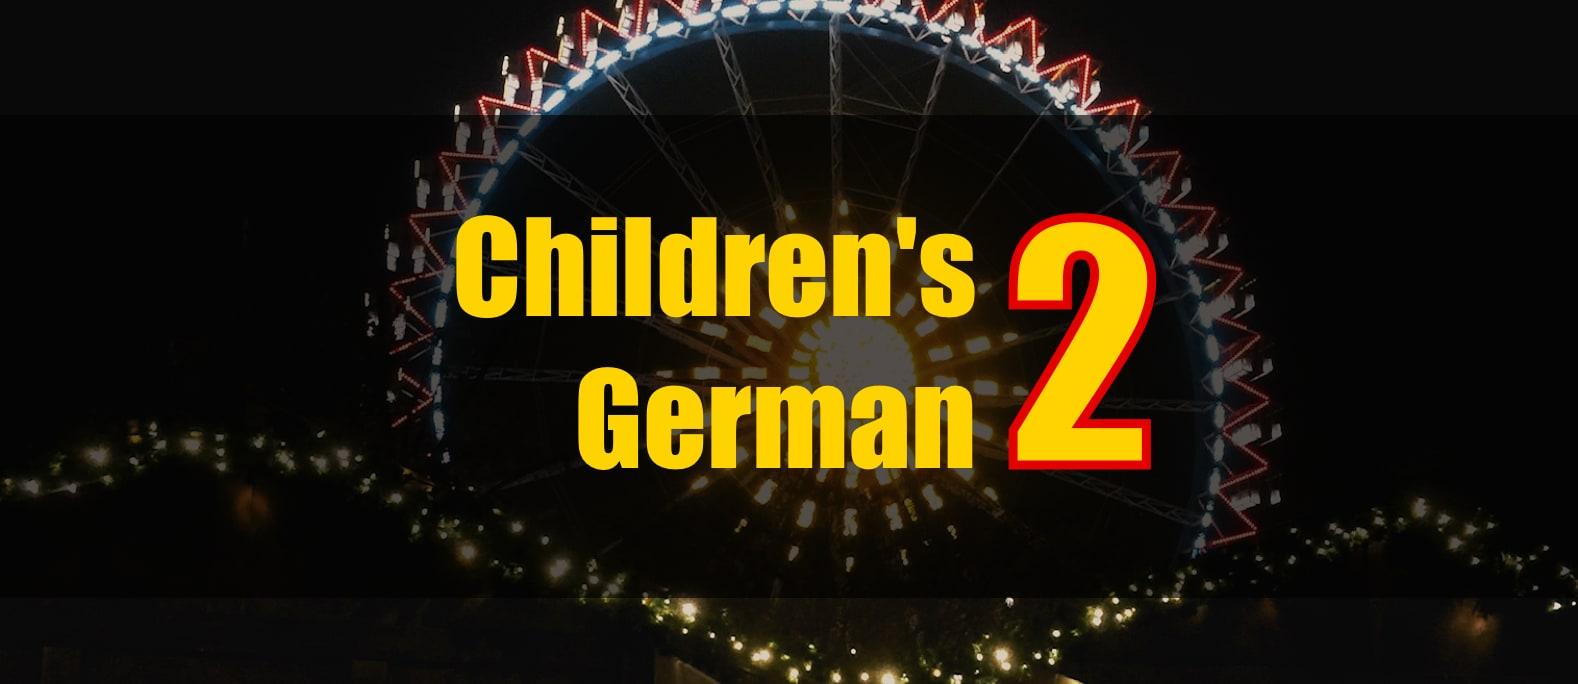 Children's German 2